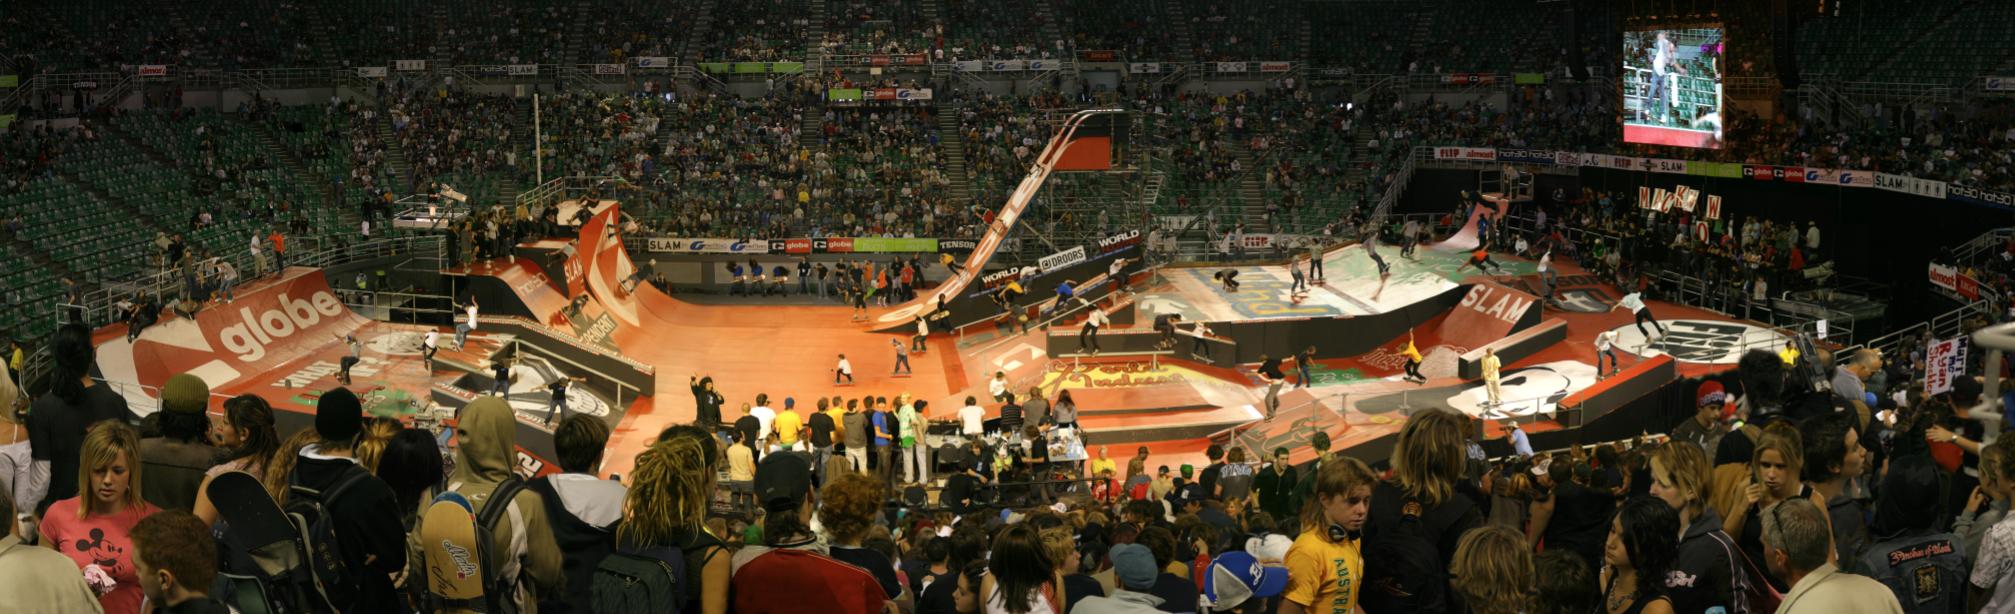 Globe 2005 - skating championships (summary)